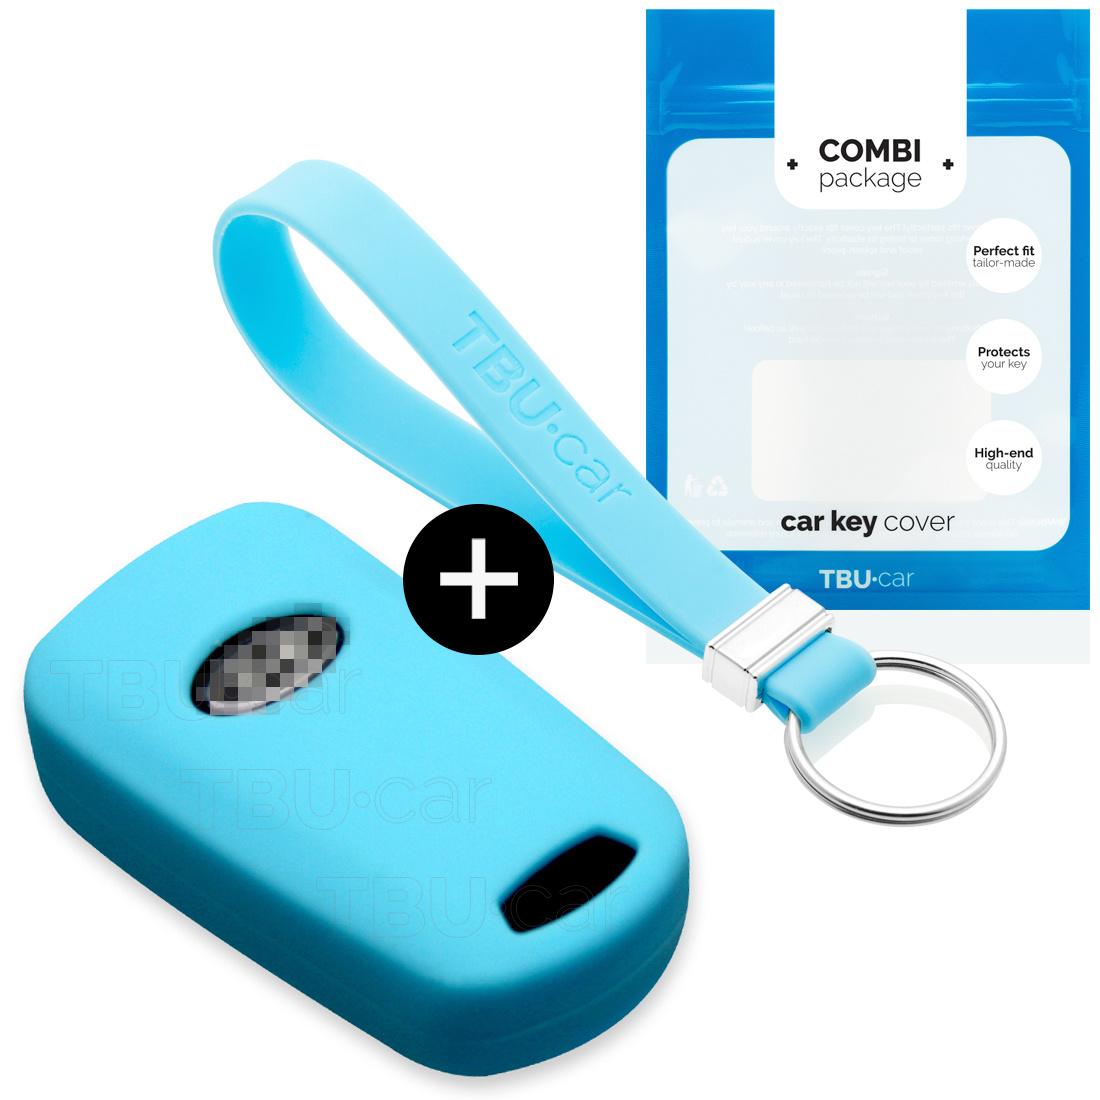 TBU car TBU car Sleutel cover compatibel met Kia - Silicone sleutelhoesje - beschermhoesje autosleutel - Lichtblauw